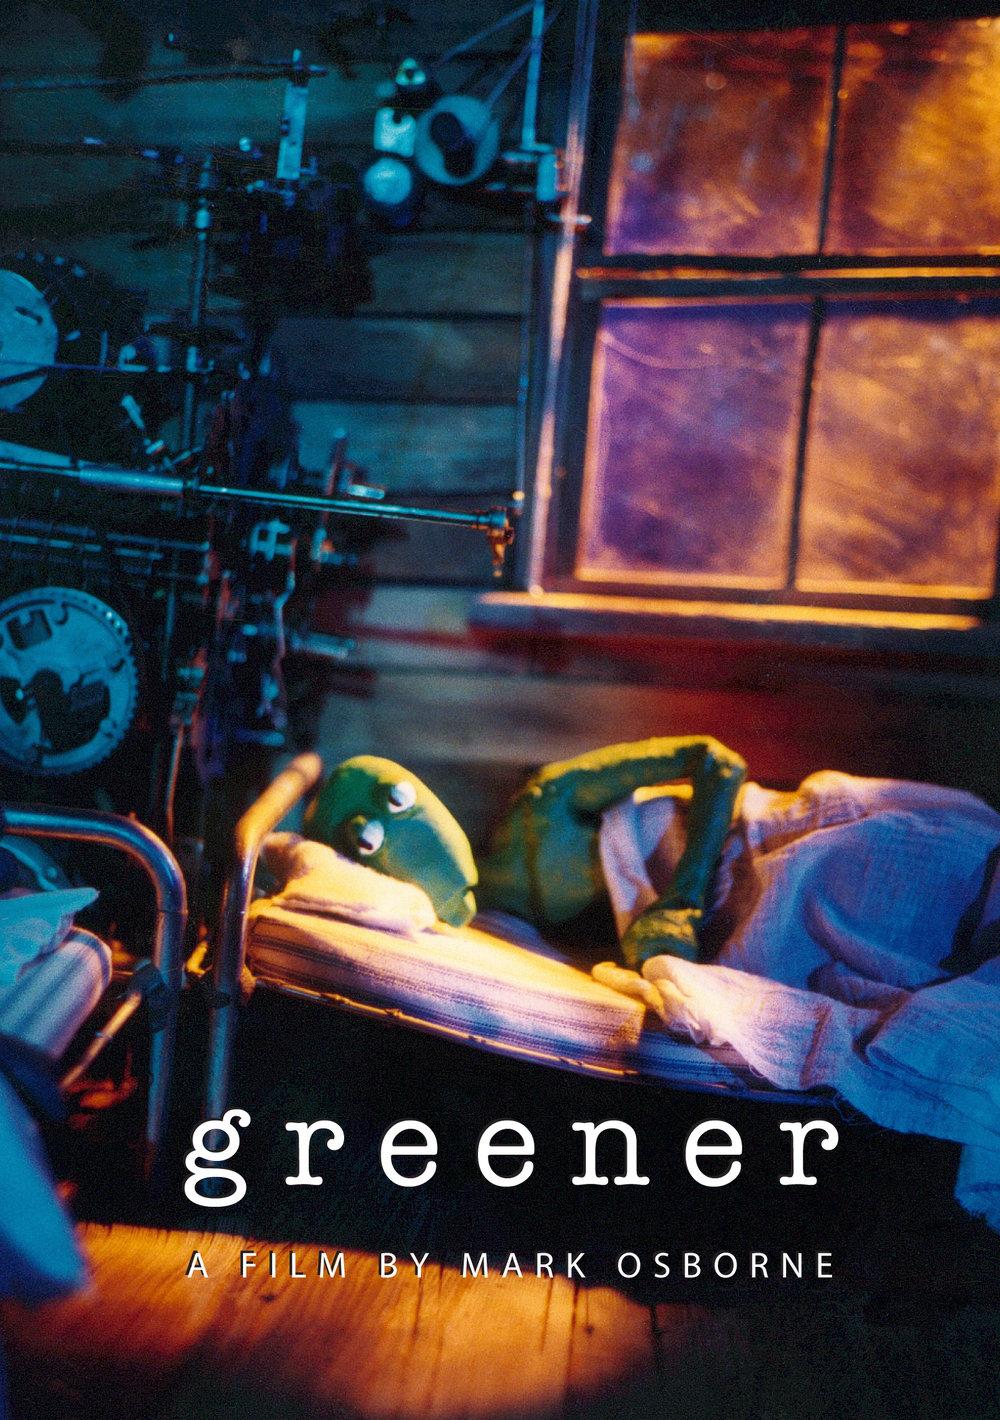 greenerPOSTER.jpg